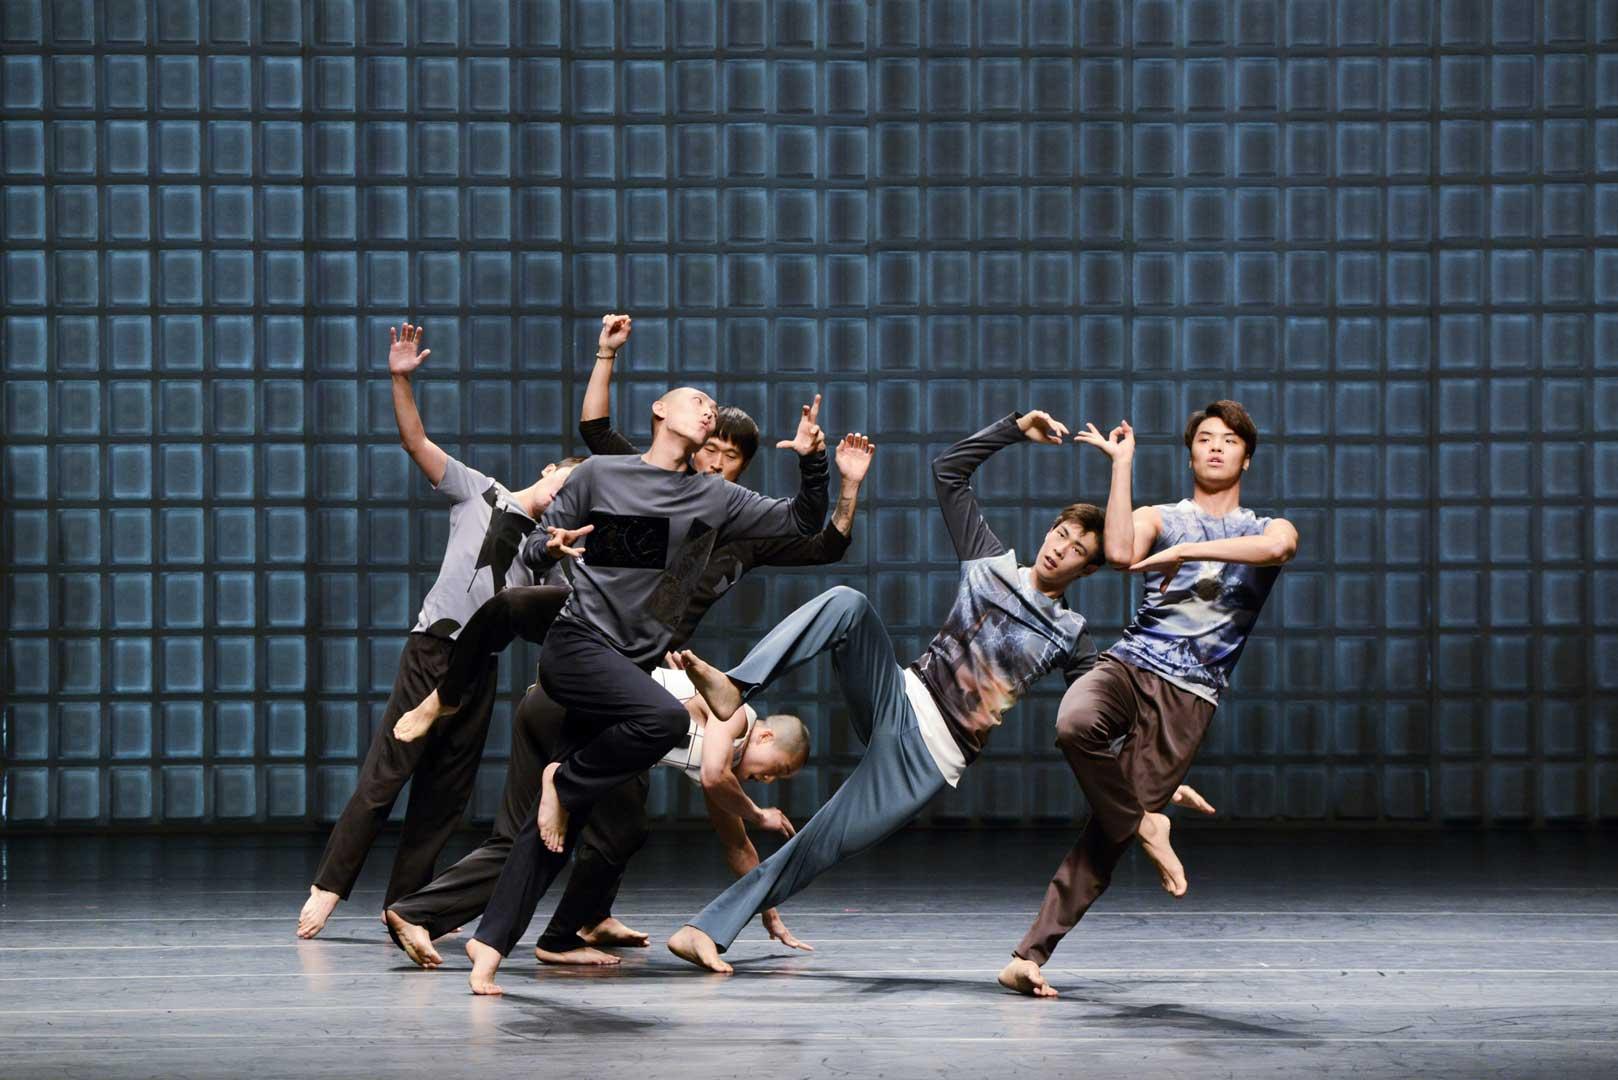 contemporarydance.jpg